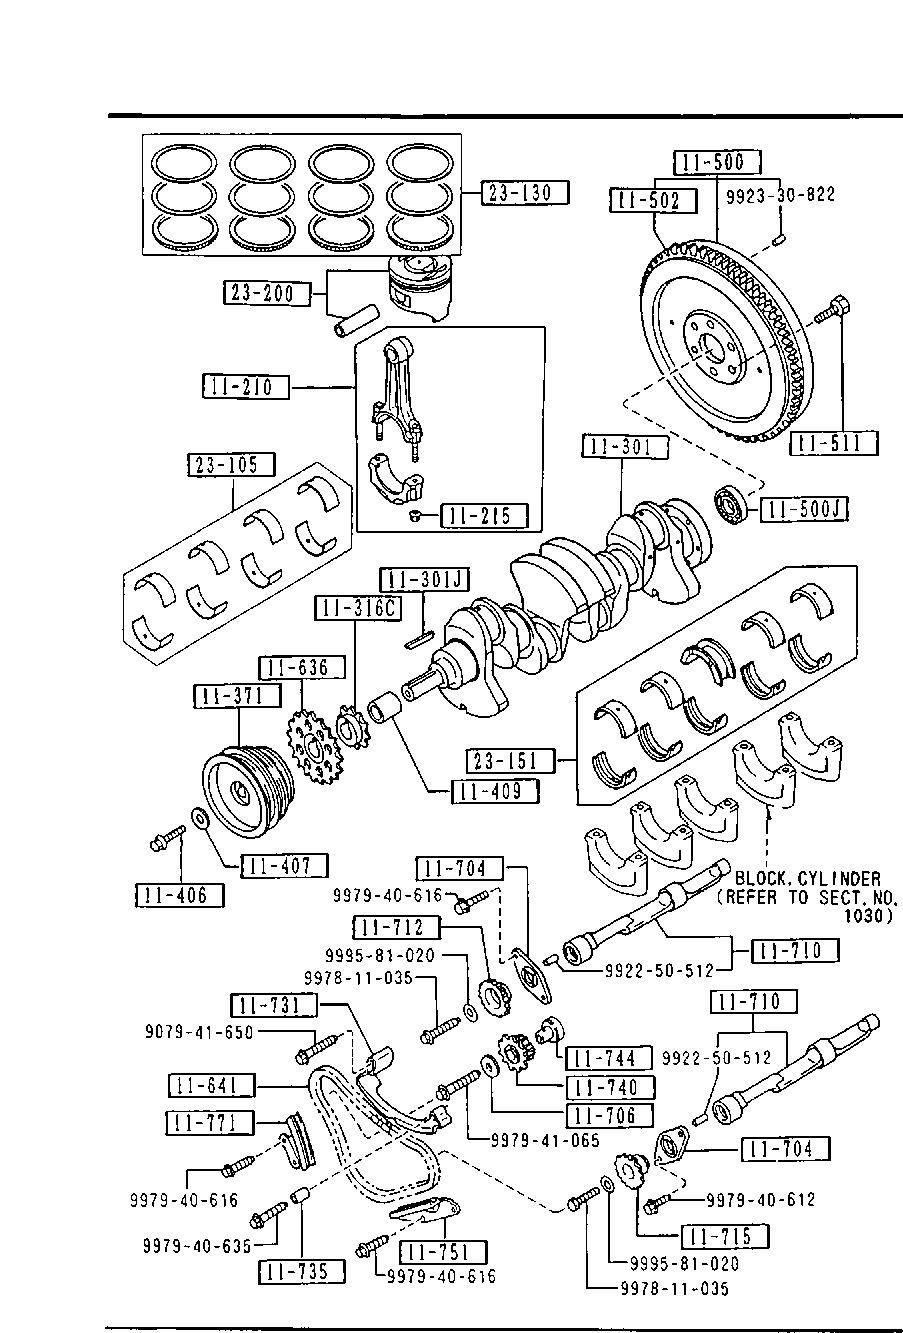 Europe B2200 Uf 11 1989 Gasoline Engine 4 Cylinder Transmission 1100 B Piston Crankshaft Flywheel Gasoline 2600cc Egi Catcar Info